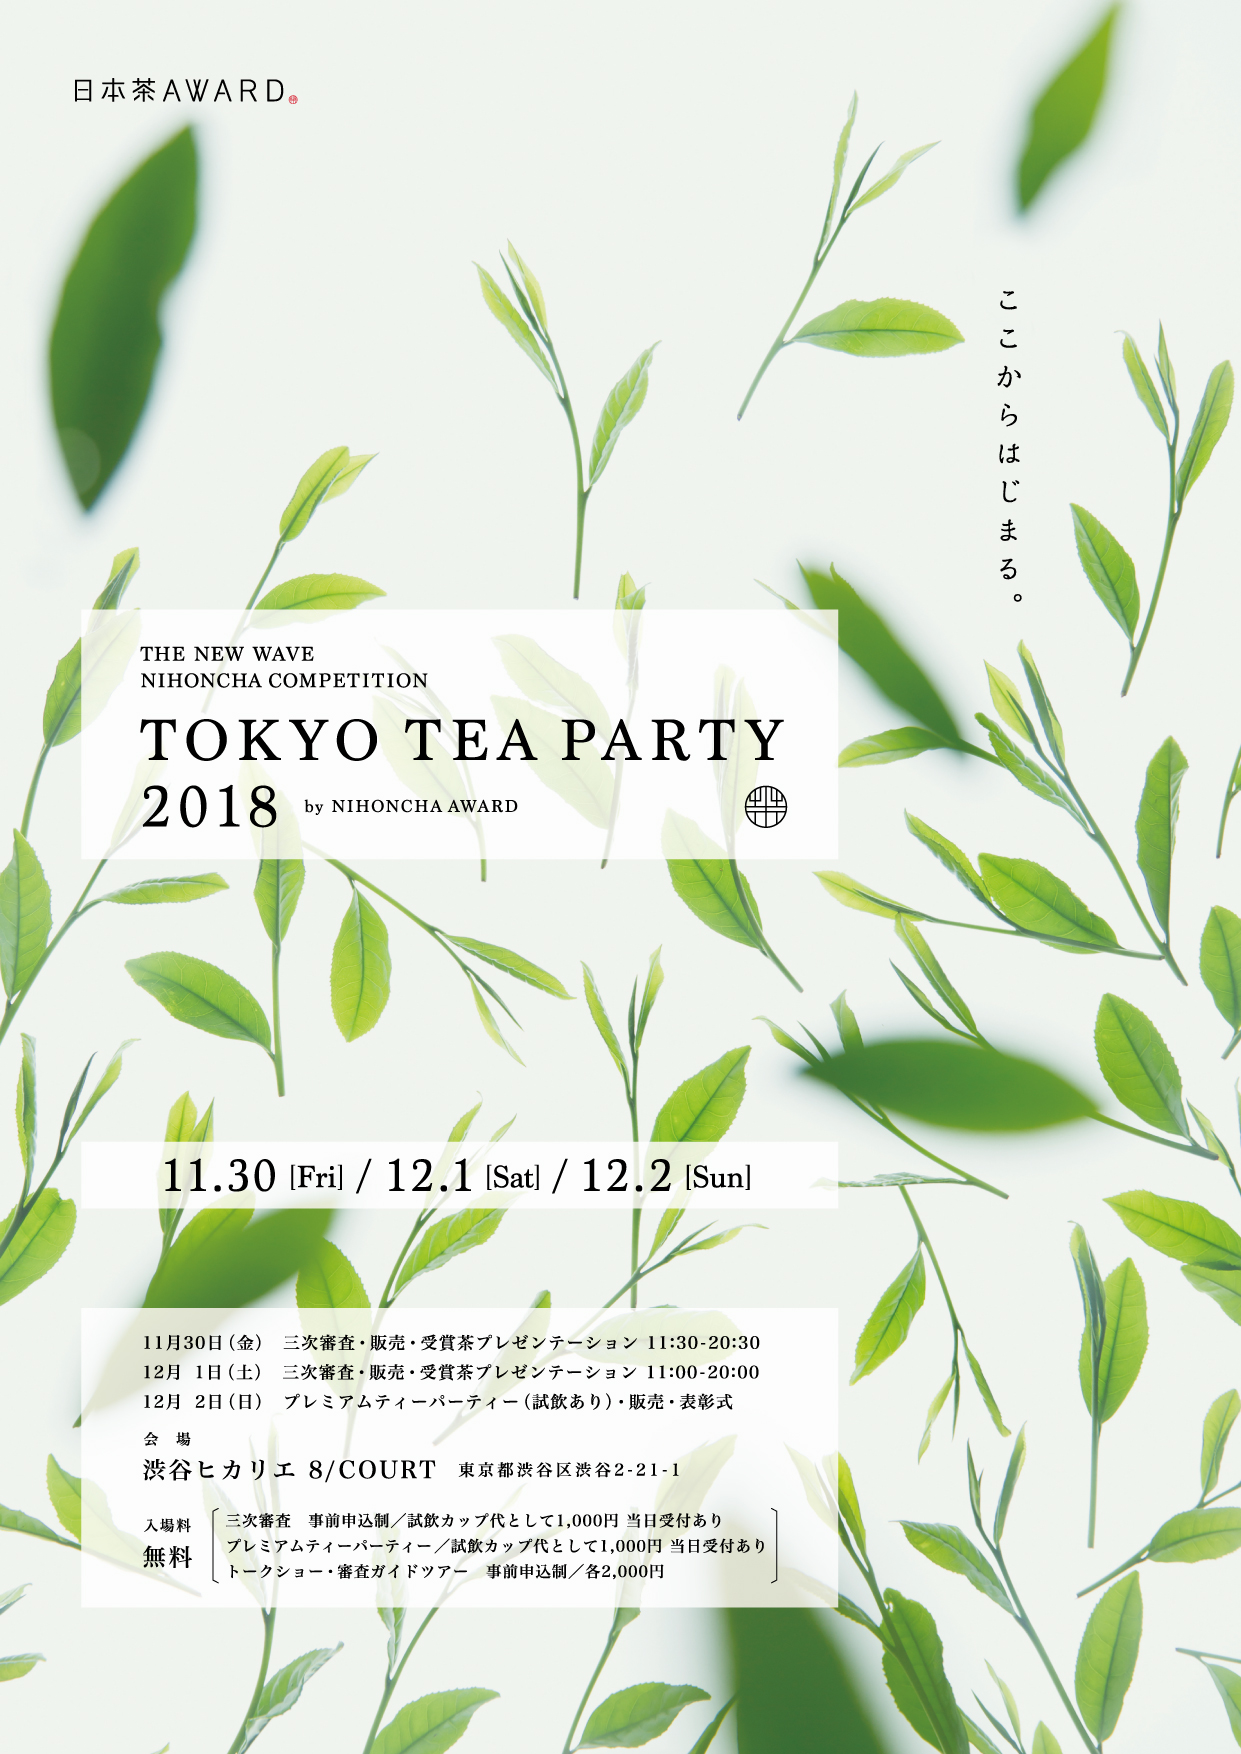 TOKYO TEA PARTY 2018